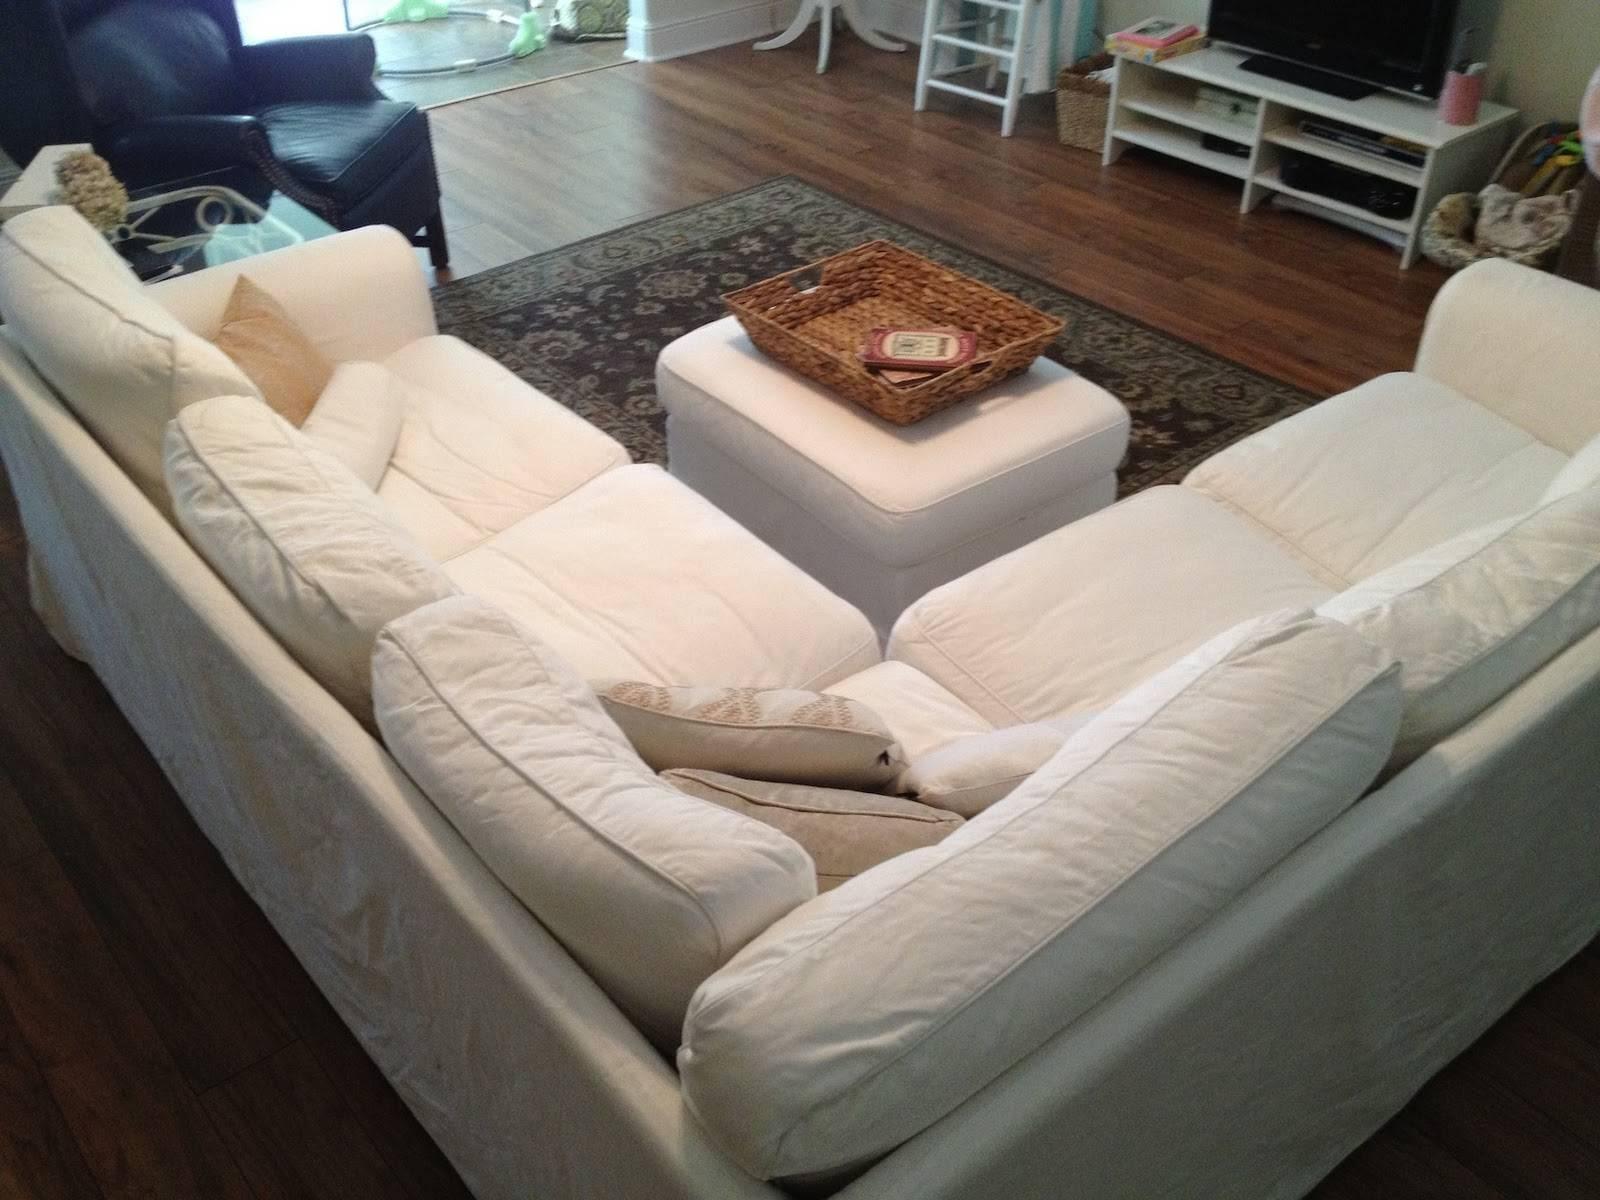 Titus 2 Work In Progress: Ikea Ektorp Sofa Review Part 2 {Follow-Up} in 2X2 Corner Sofas (Image 24 of 30)